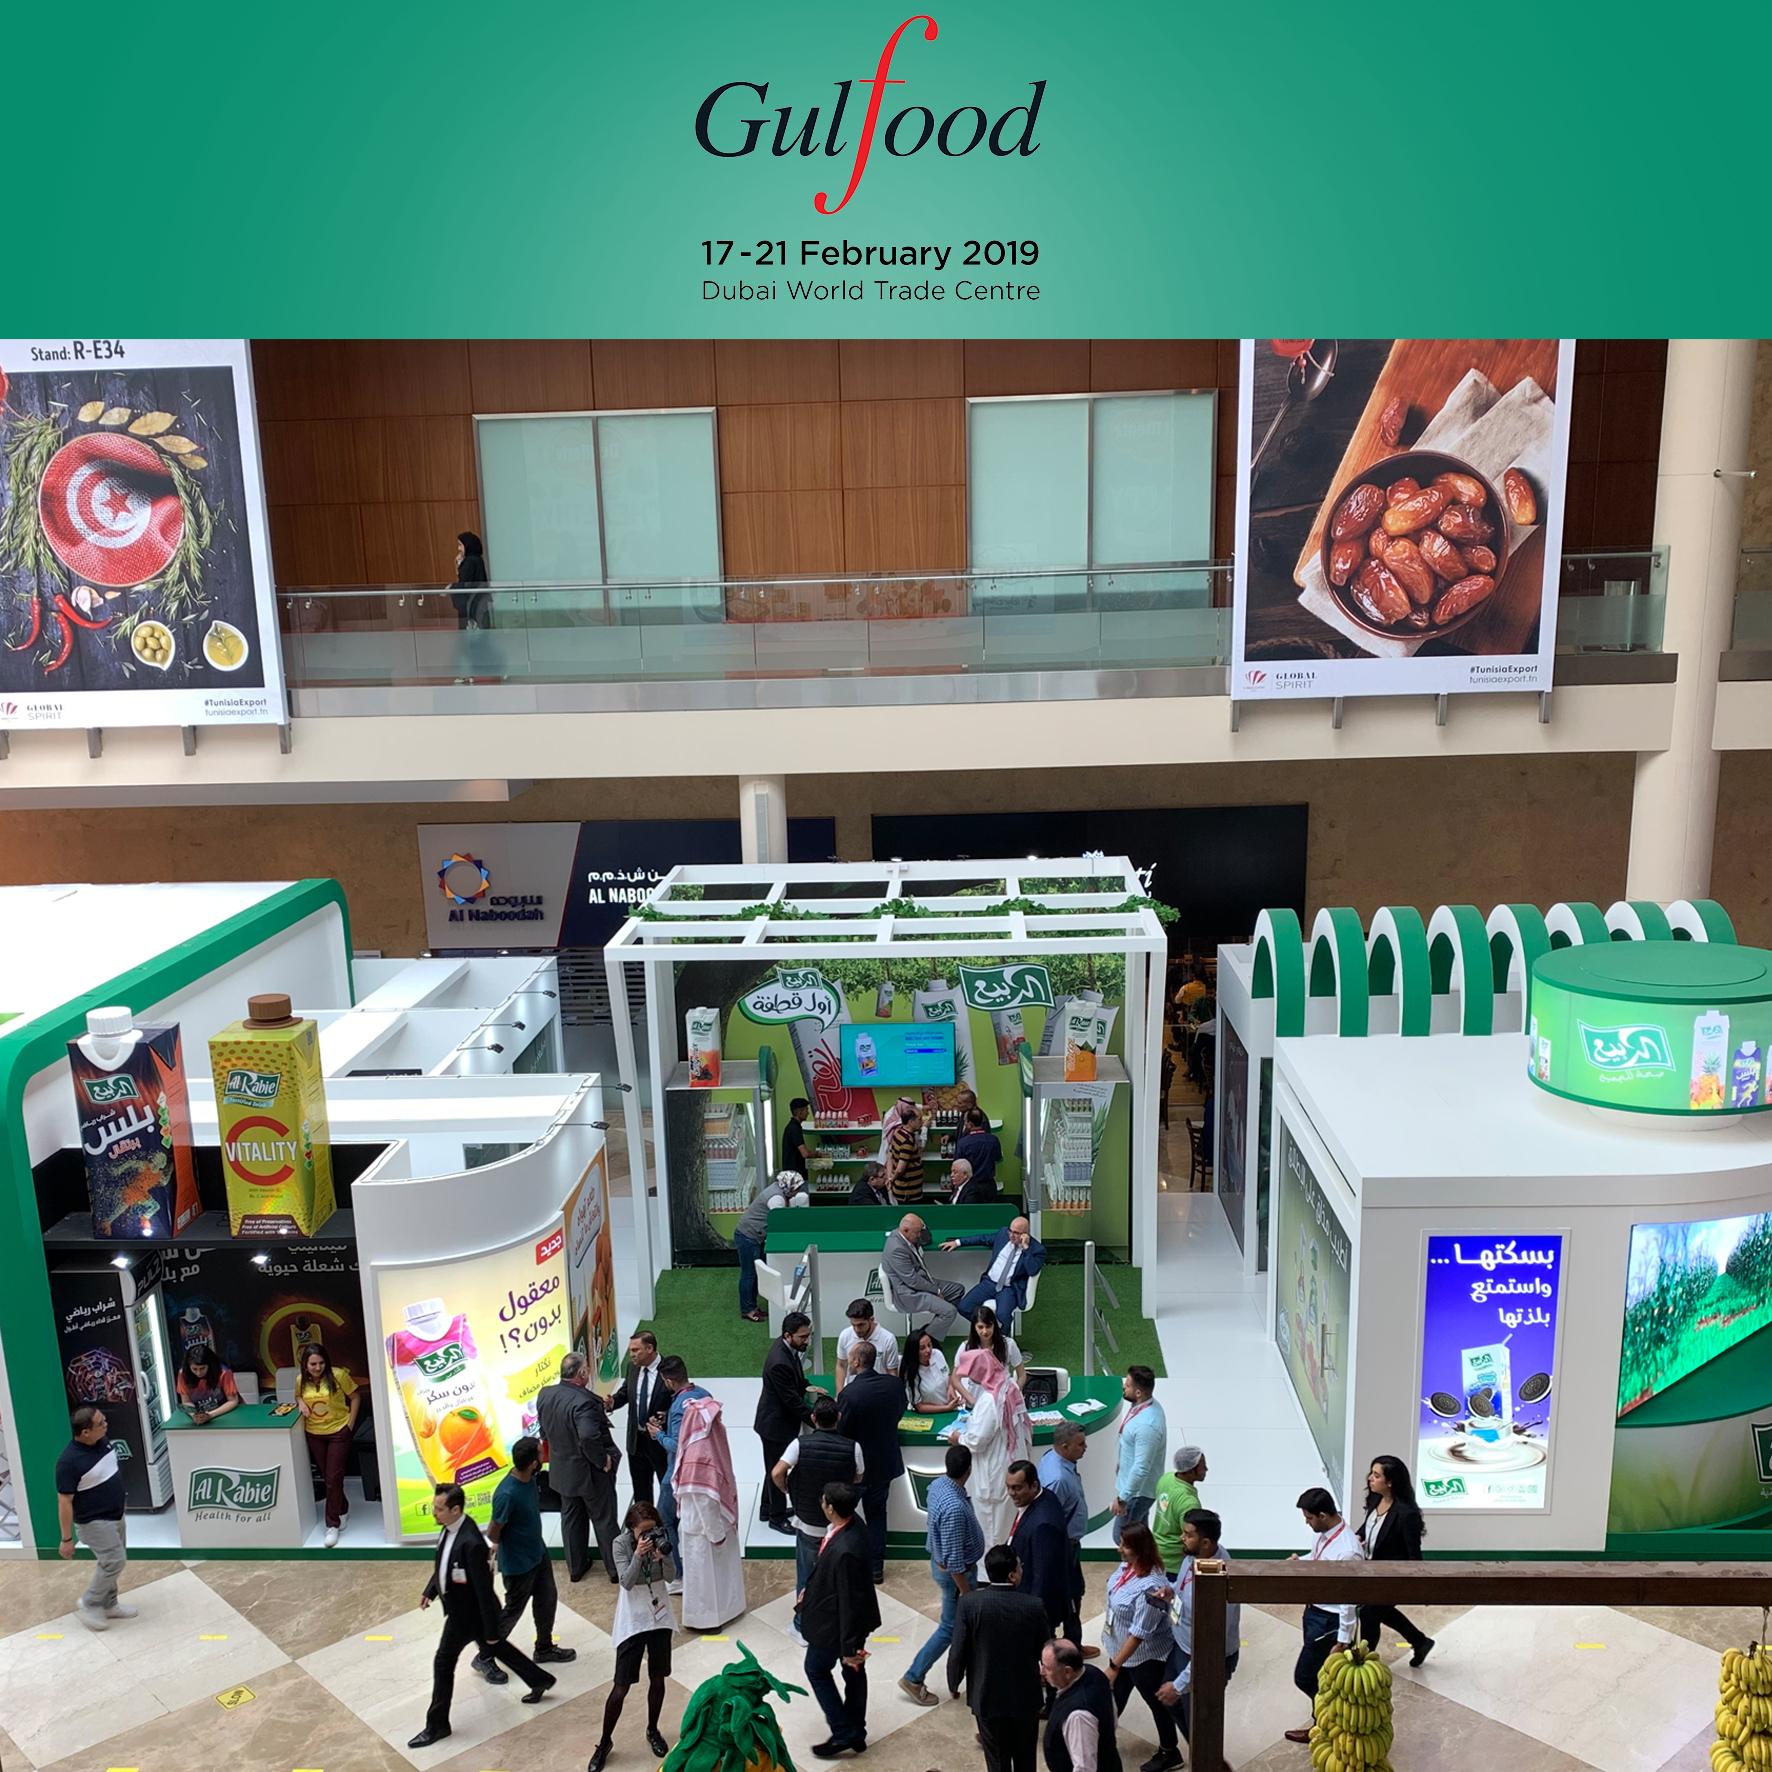 Al Rabie Saudi Foods Co. at GulFood 2019